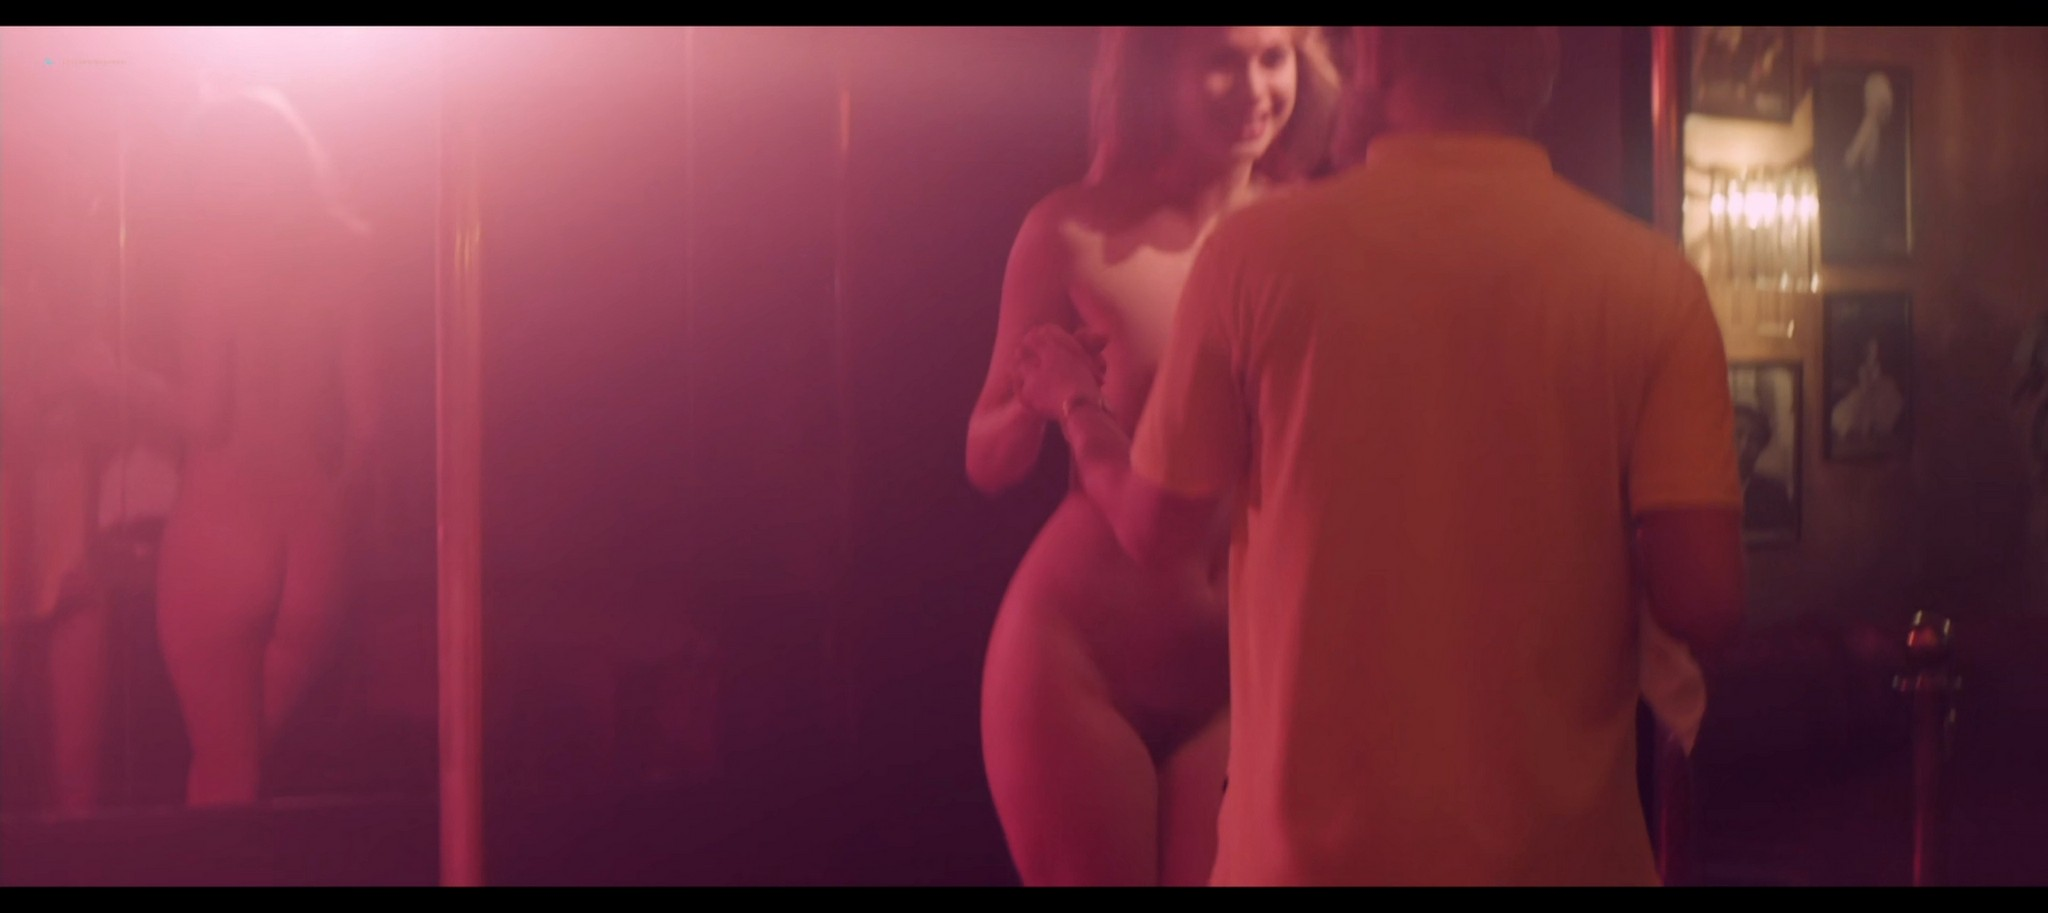 Camilla Cornelia Lehmann nude Sarahsita Lassen, nude and explicit body parts - Spies Og Glistrup (DK-2013) HD 1080p BluRay (12)